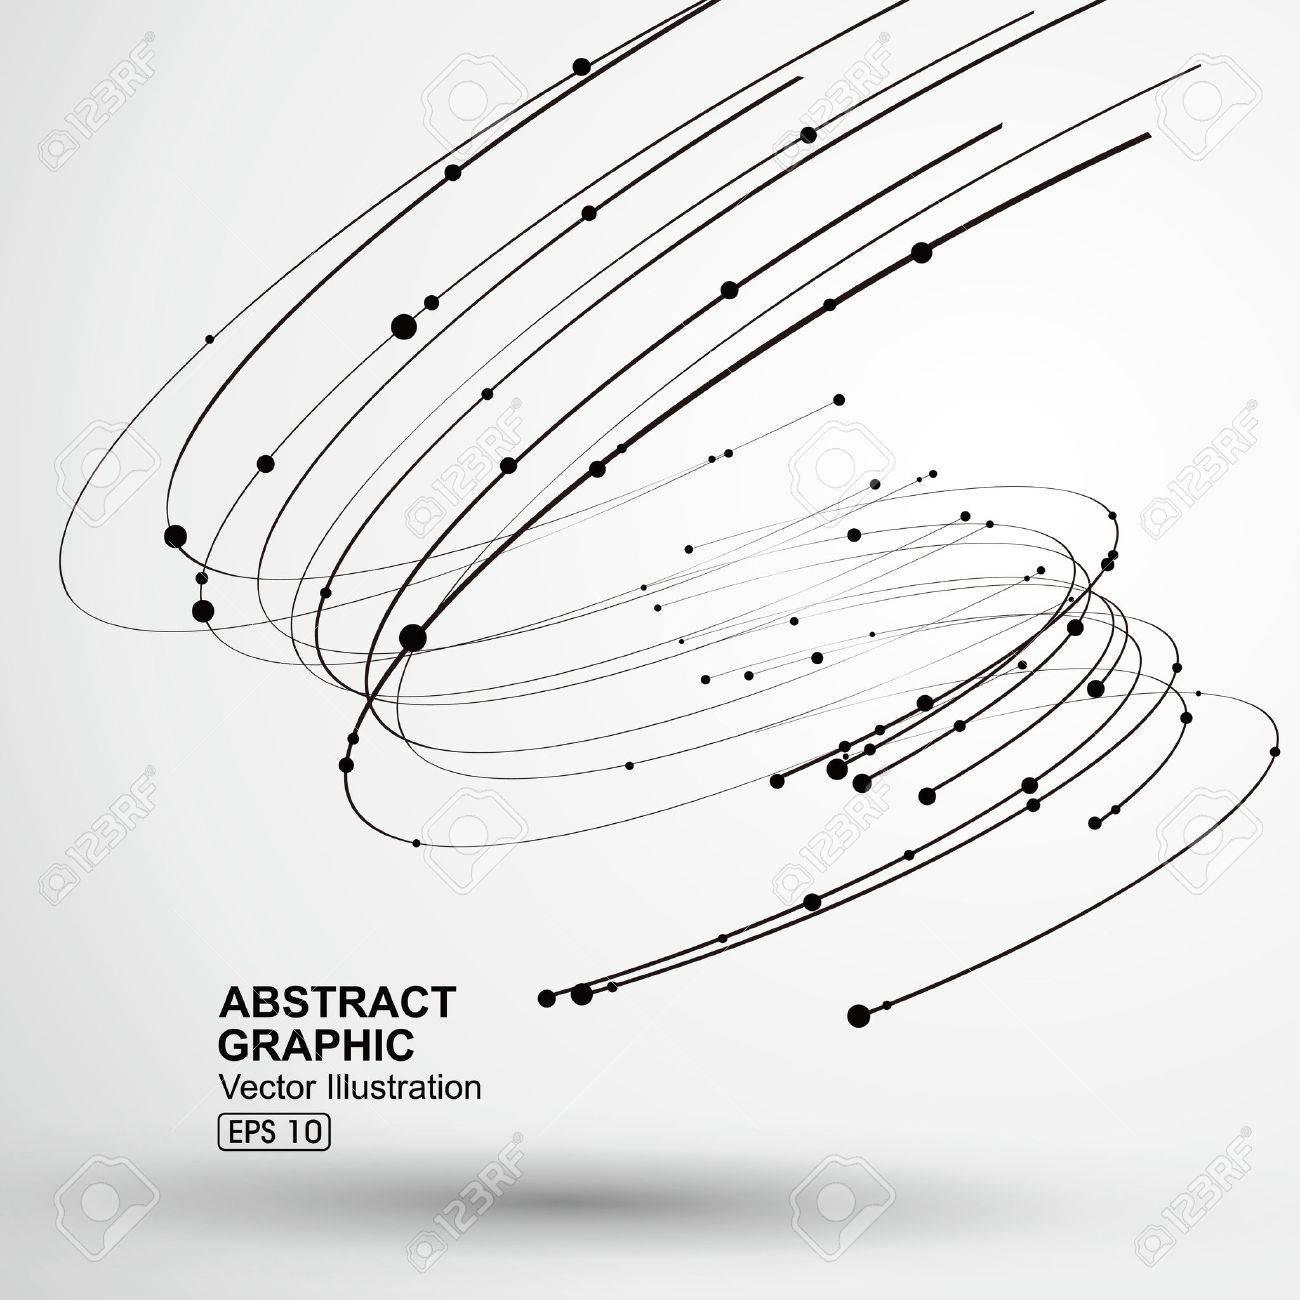 Vector Tornado,Abstract graphics. - 53259139